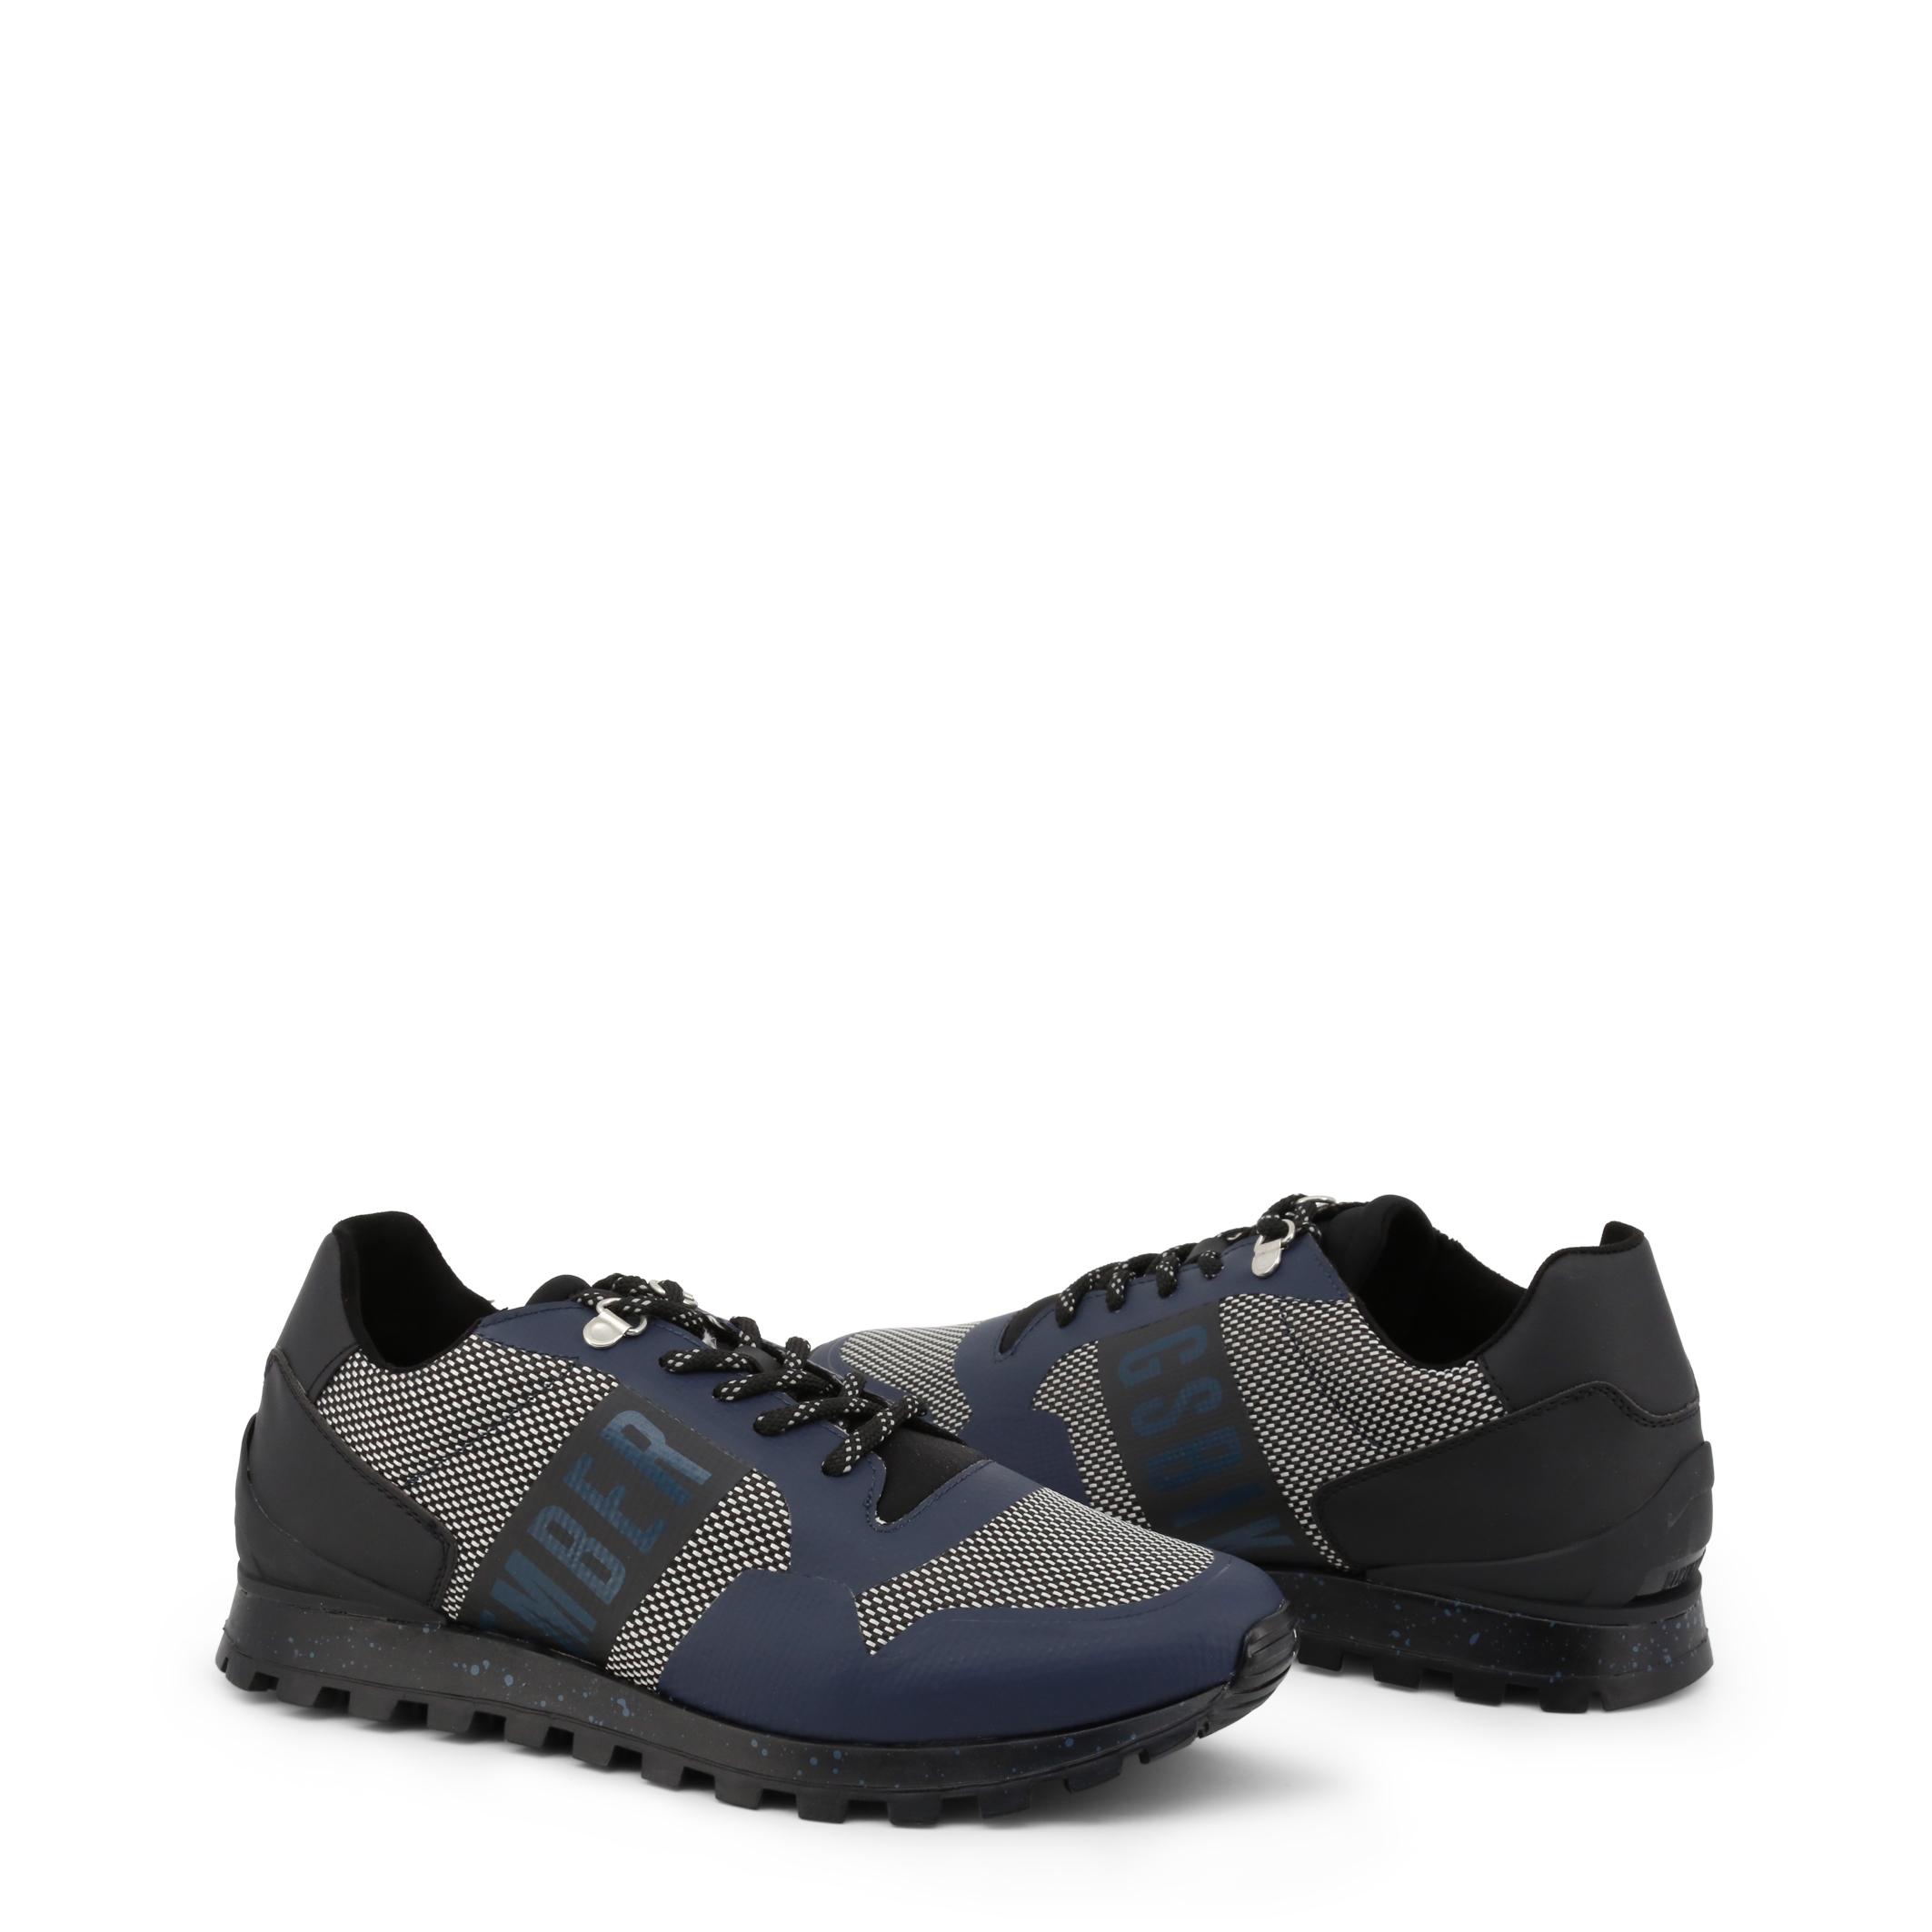 Sneakers-Bikkembergs-FEND-ER-2217-Uomo-Blu-101350 miniatura 2